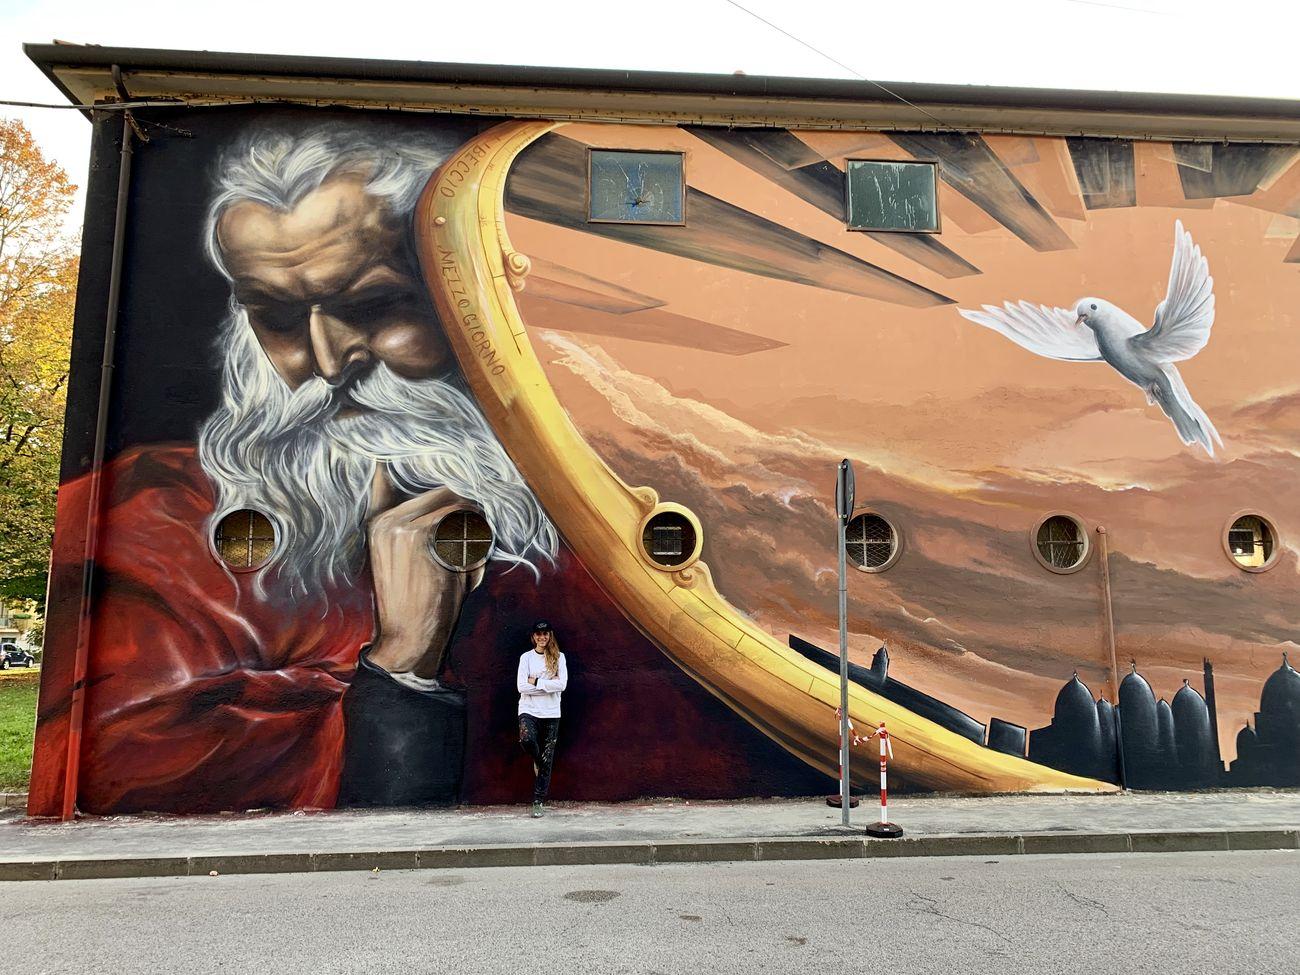 SteReal, Illuminami, Padova, 2019